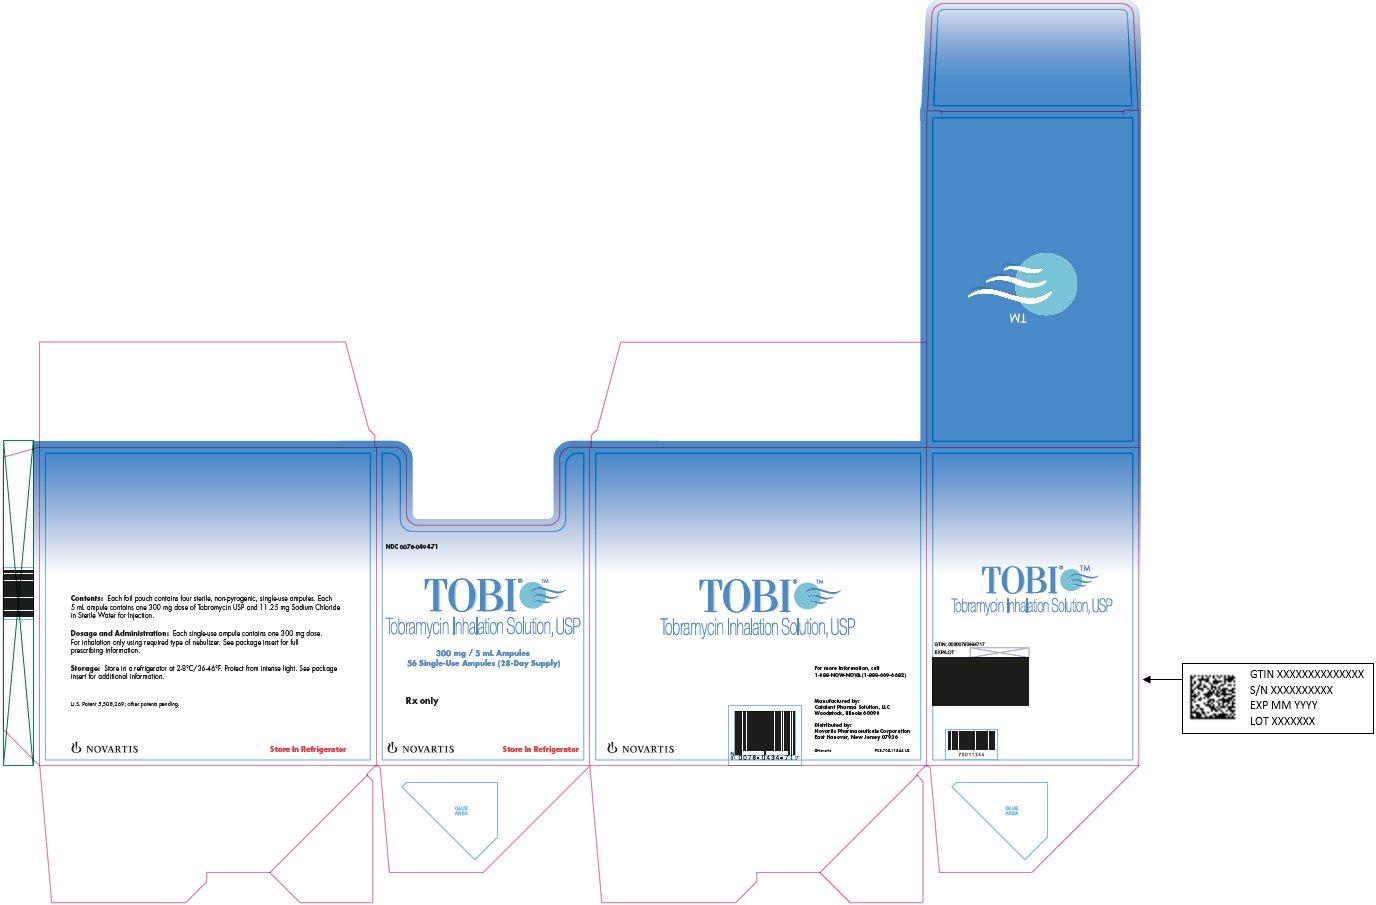 TOBI® 300 mg/5 mL Ampules Carton Label